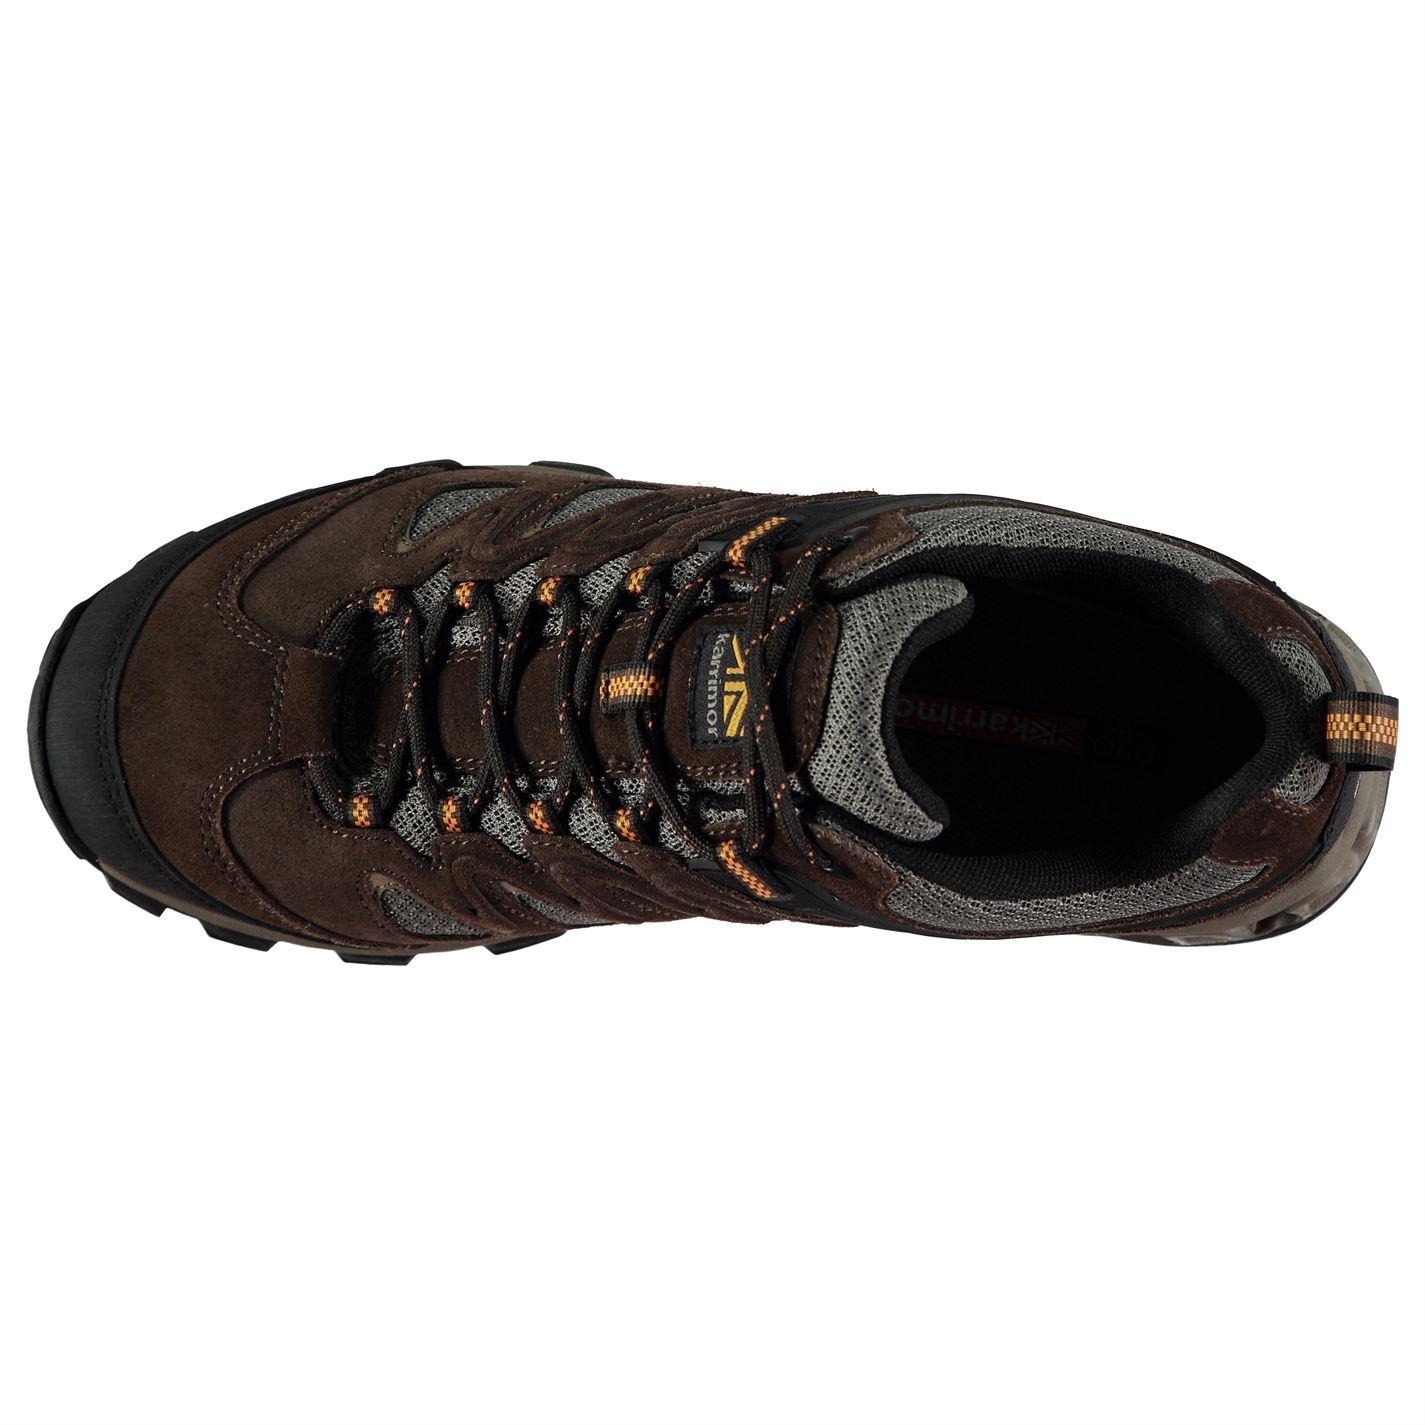 Karrimor Mens Merlin Low Walking Shoes Waterproof Lace Up Breathable Comfortable